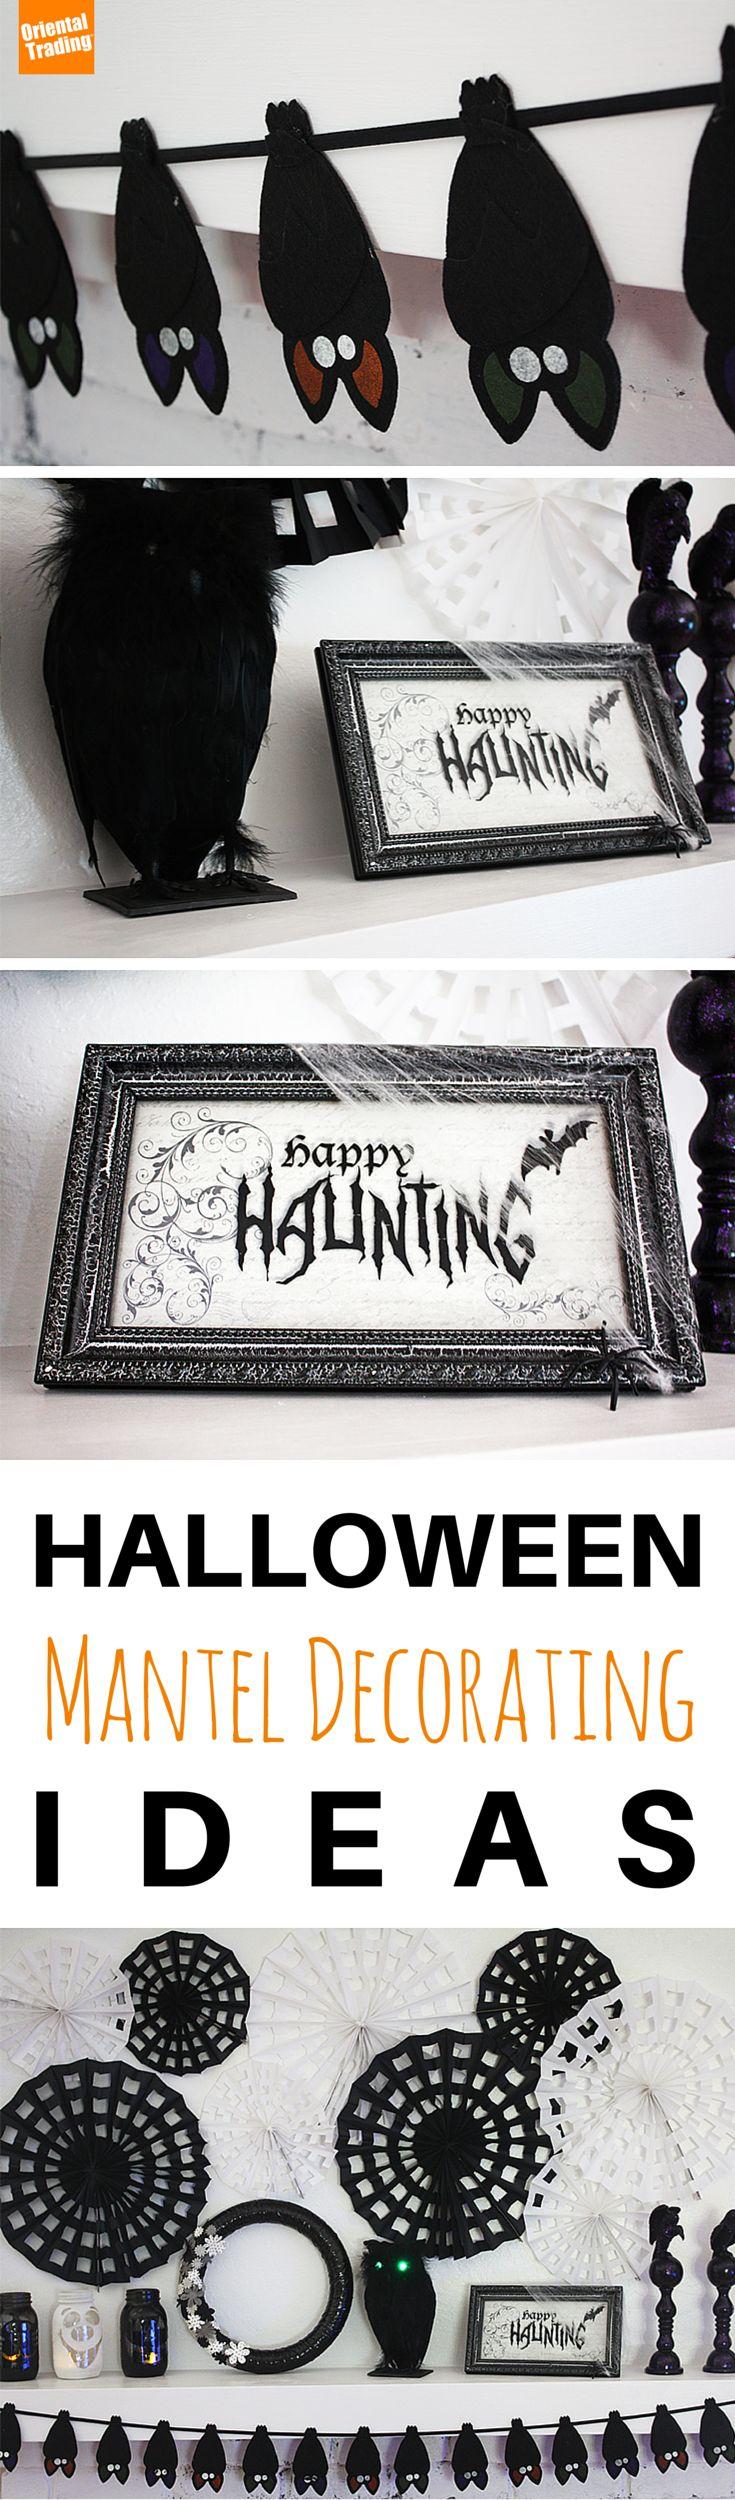 3054 best Halloween Decorating Ideas & Scare Tactics (indoors and ...